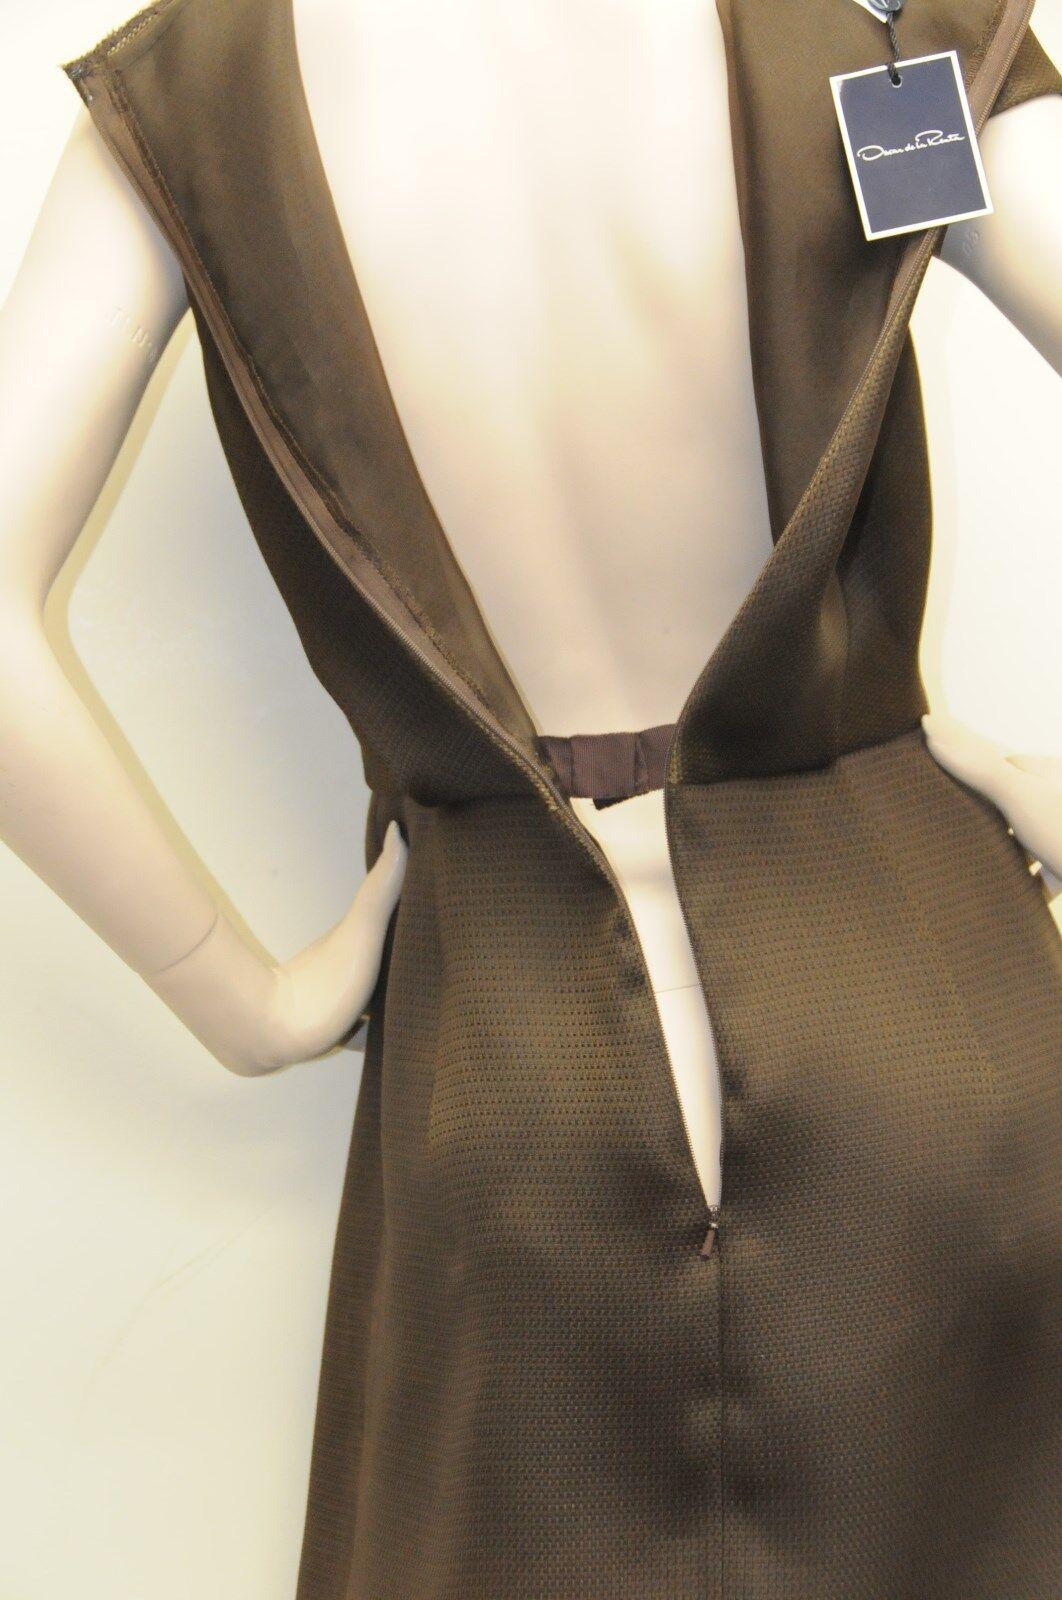 2350  New New New Oscar de la Renta Pique Gazar Asym SS Brown Silk RUNWAY DRESS size 6 1d55b4